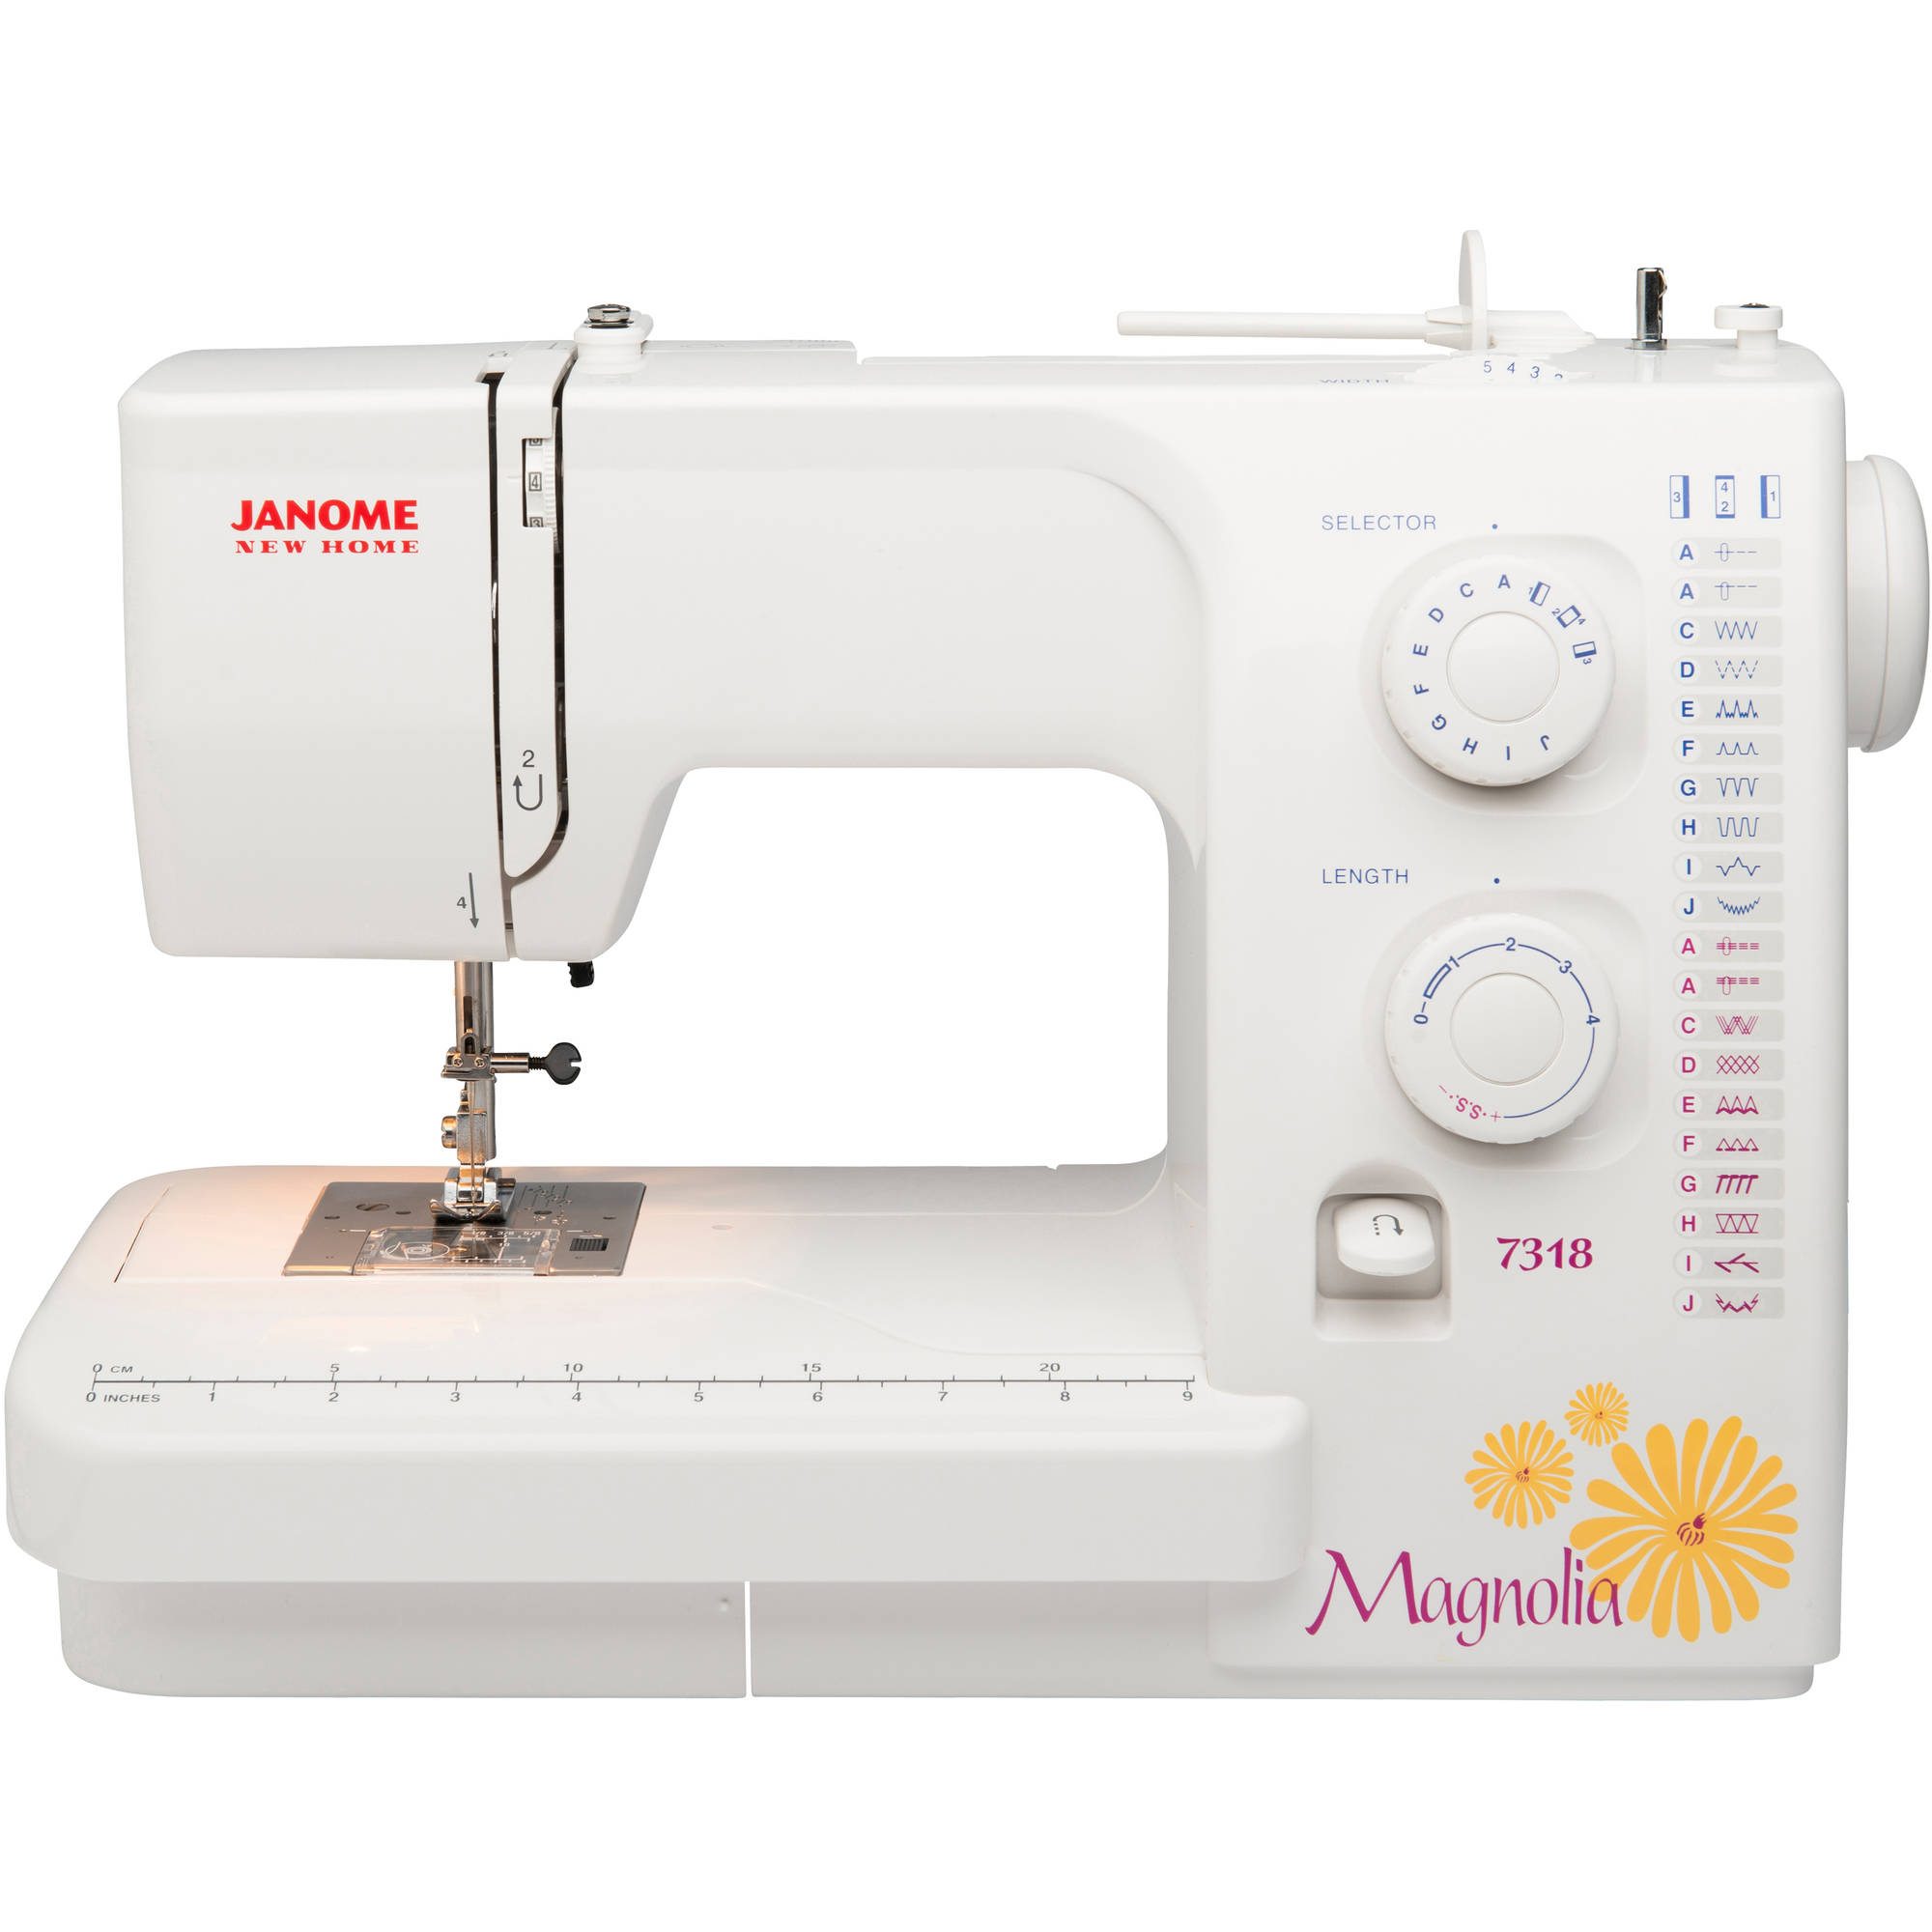 Janome 7318 Magnolia 18-Stitch One 4-Step Buttonhole Sewing Machine